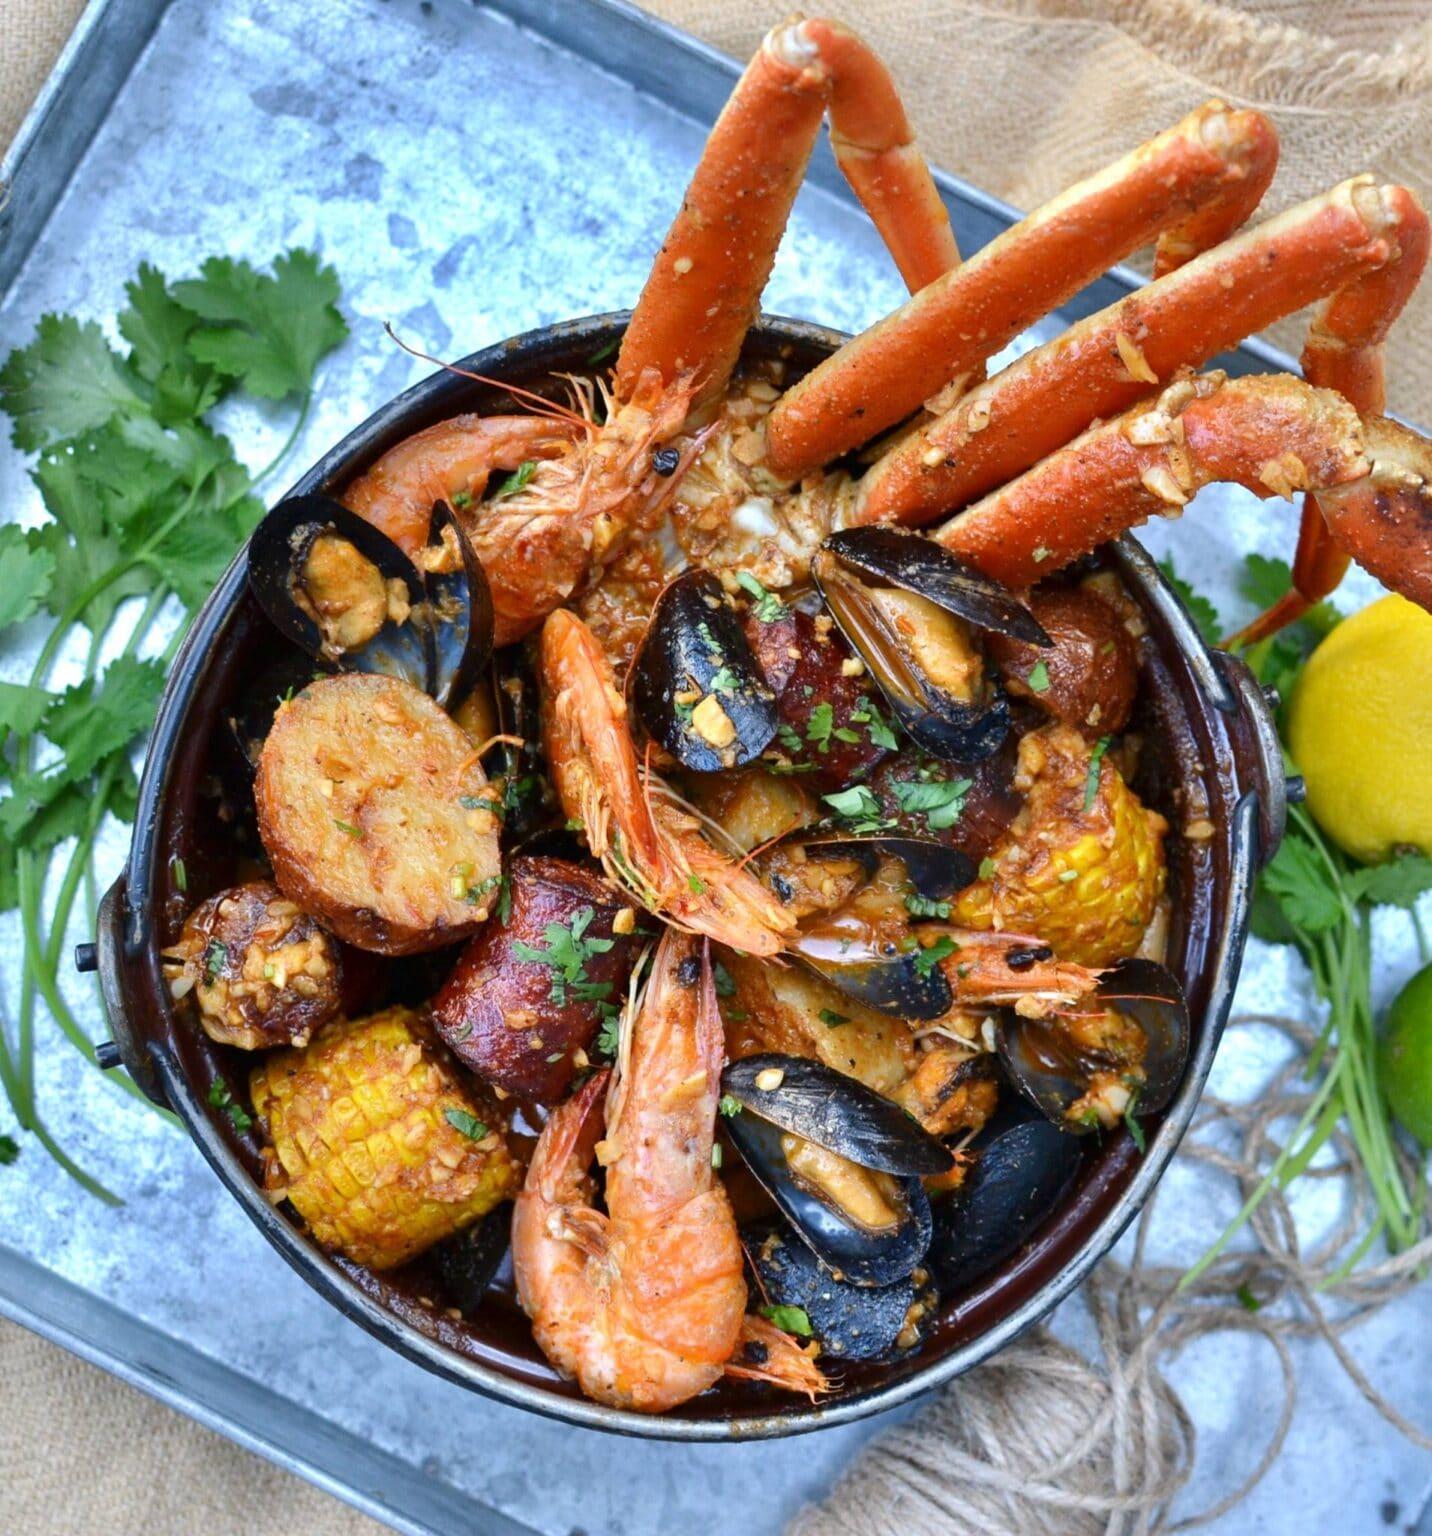 food from Almanzar